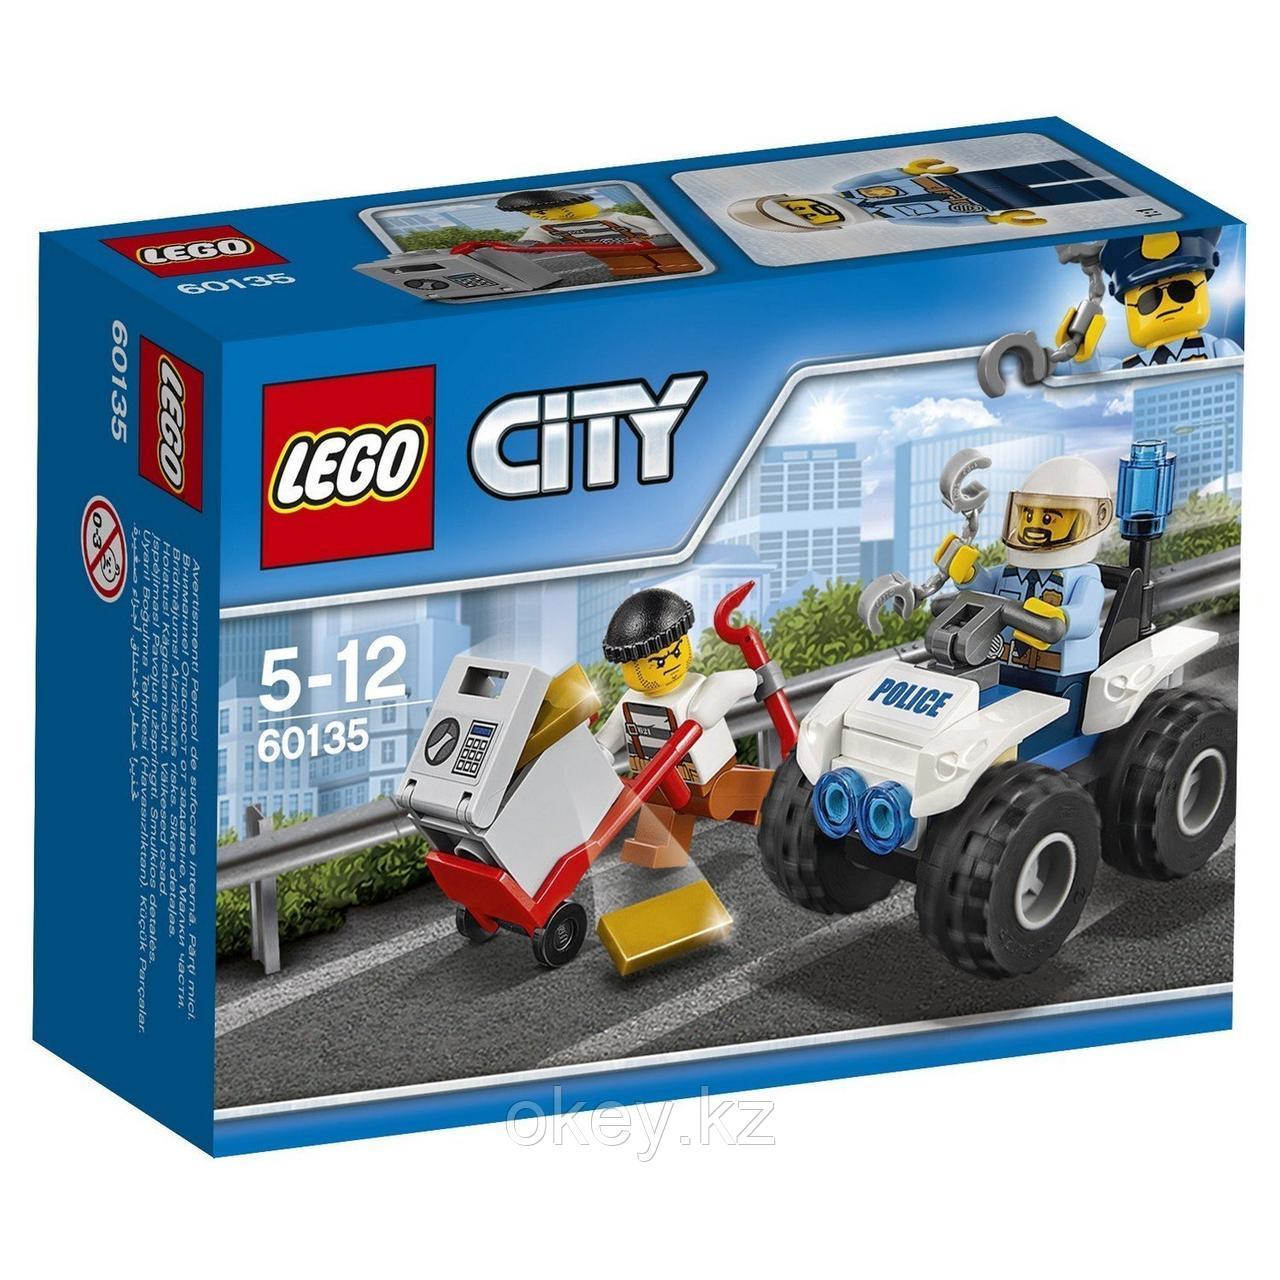 LEGO City: Полицейский квадроцикл 60135